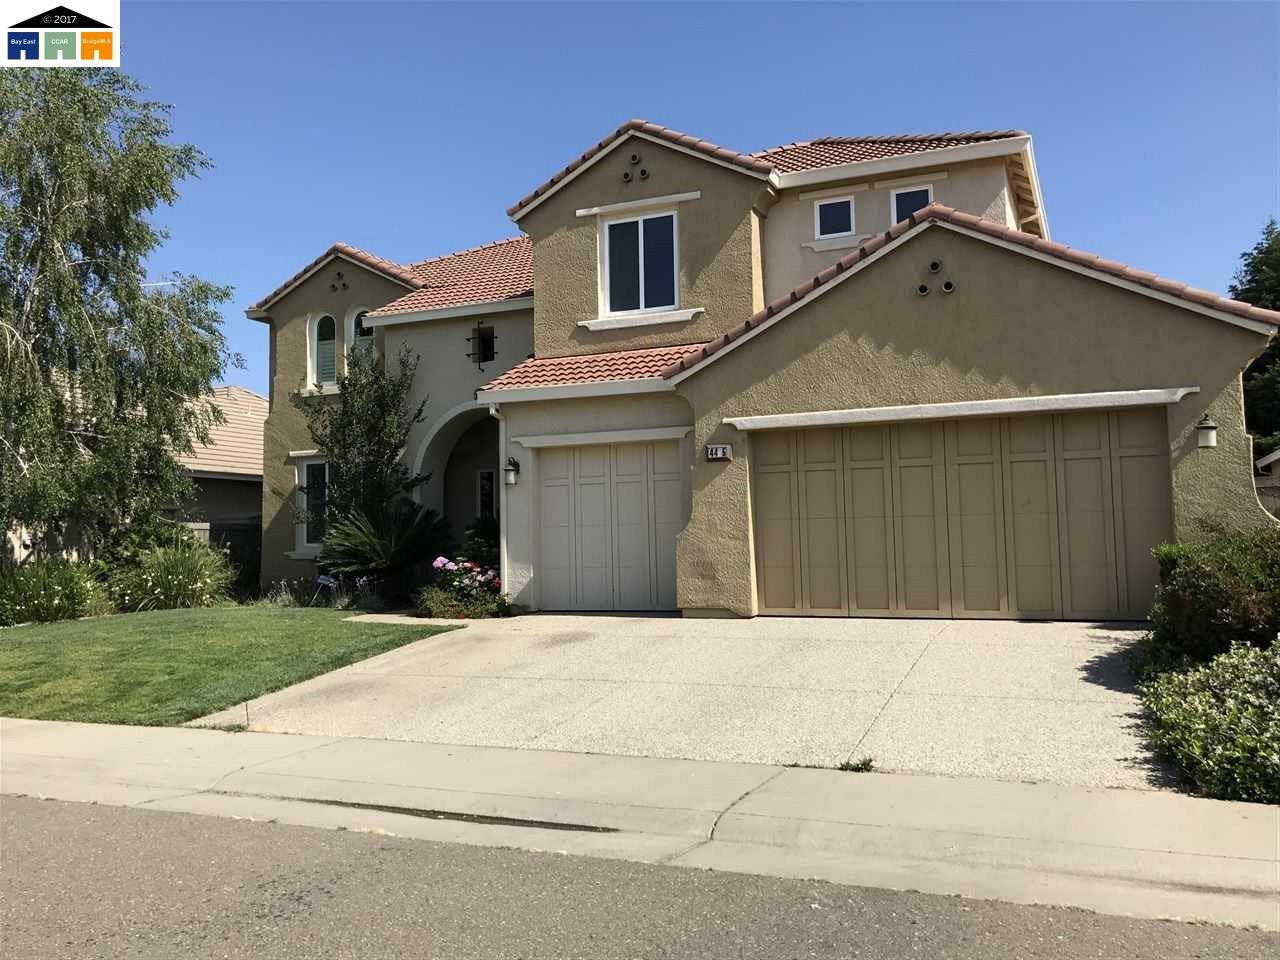 獨棟家庭住宅 為 出售 在 4425 SOPHISTRY DRIVE 4425 SOPHISTRY DRIVE Rancho Cordova, 加利福尼亞州 95742 美國